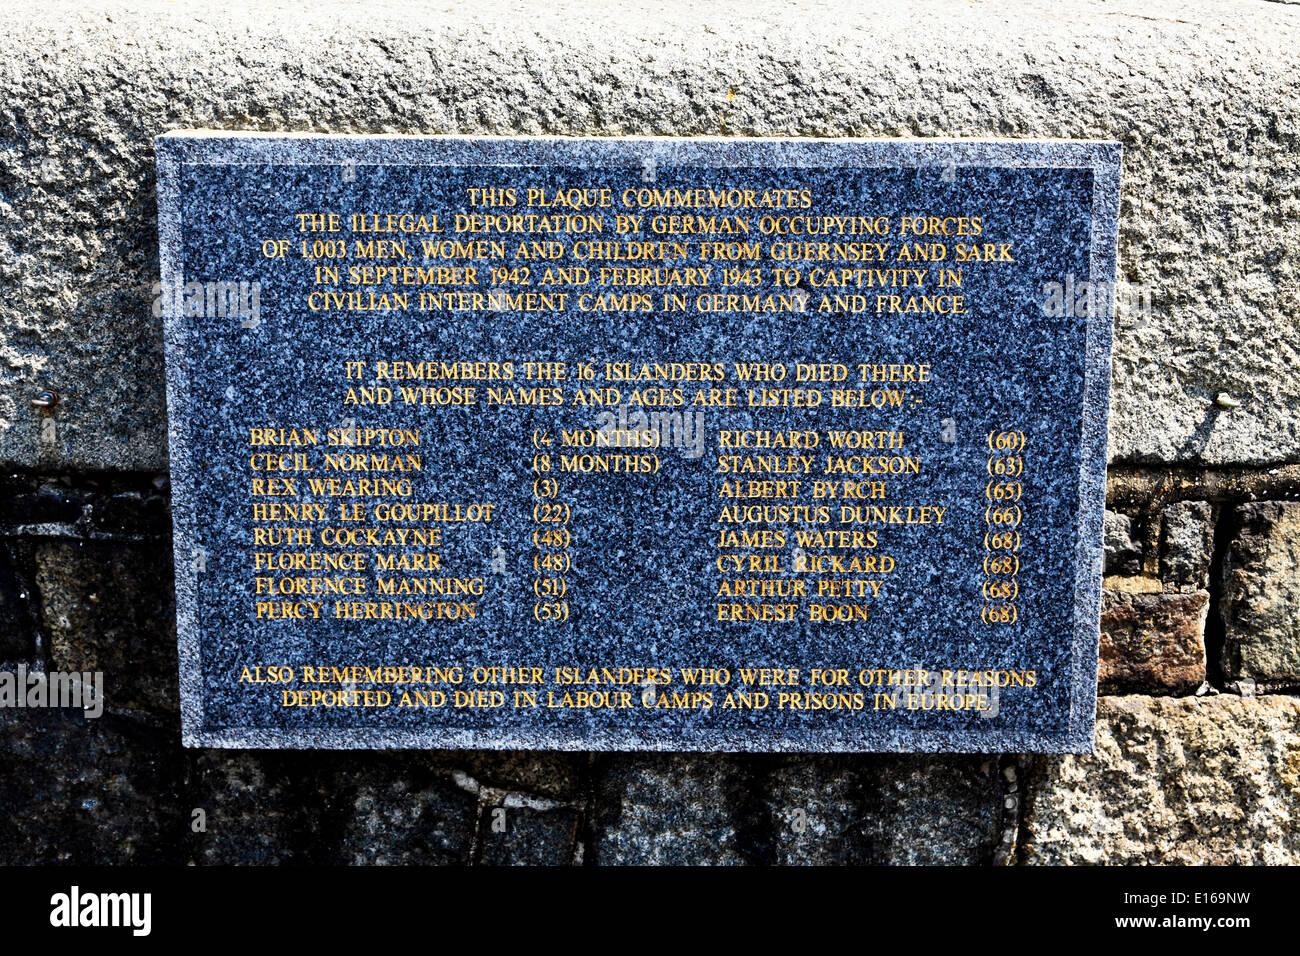 9202. St Peter Port, WW2 War Memorial, Guernsey, Channel Islands, UK, Europe - Stock Image